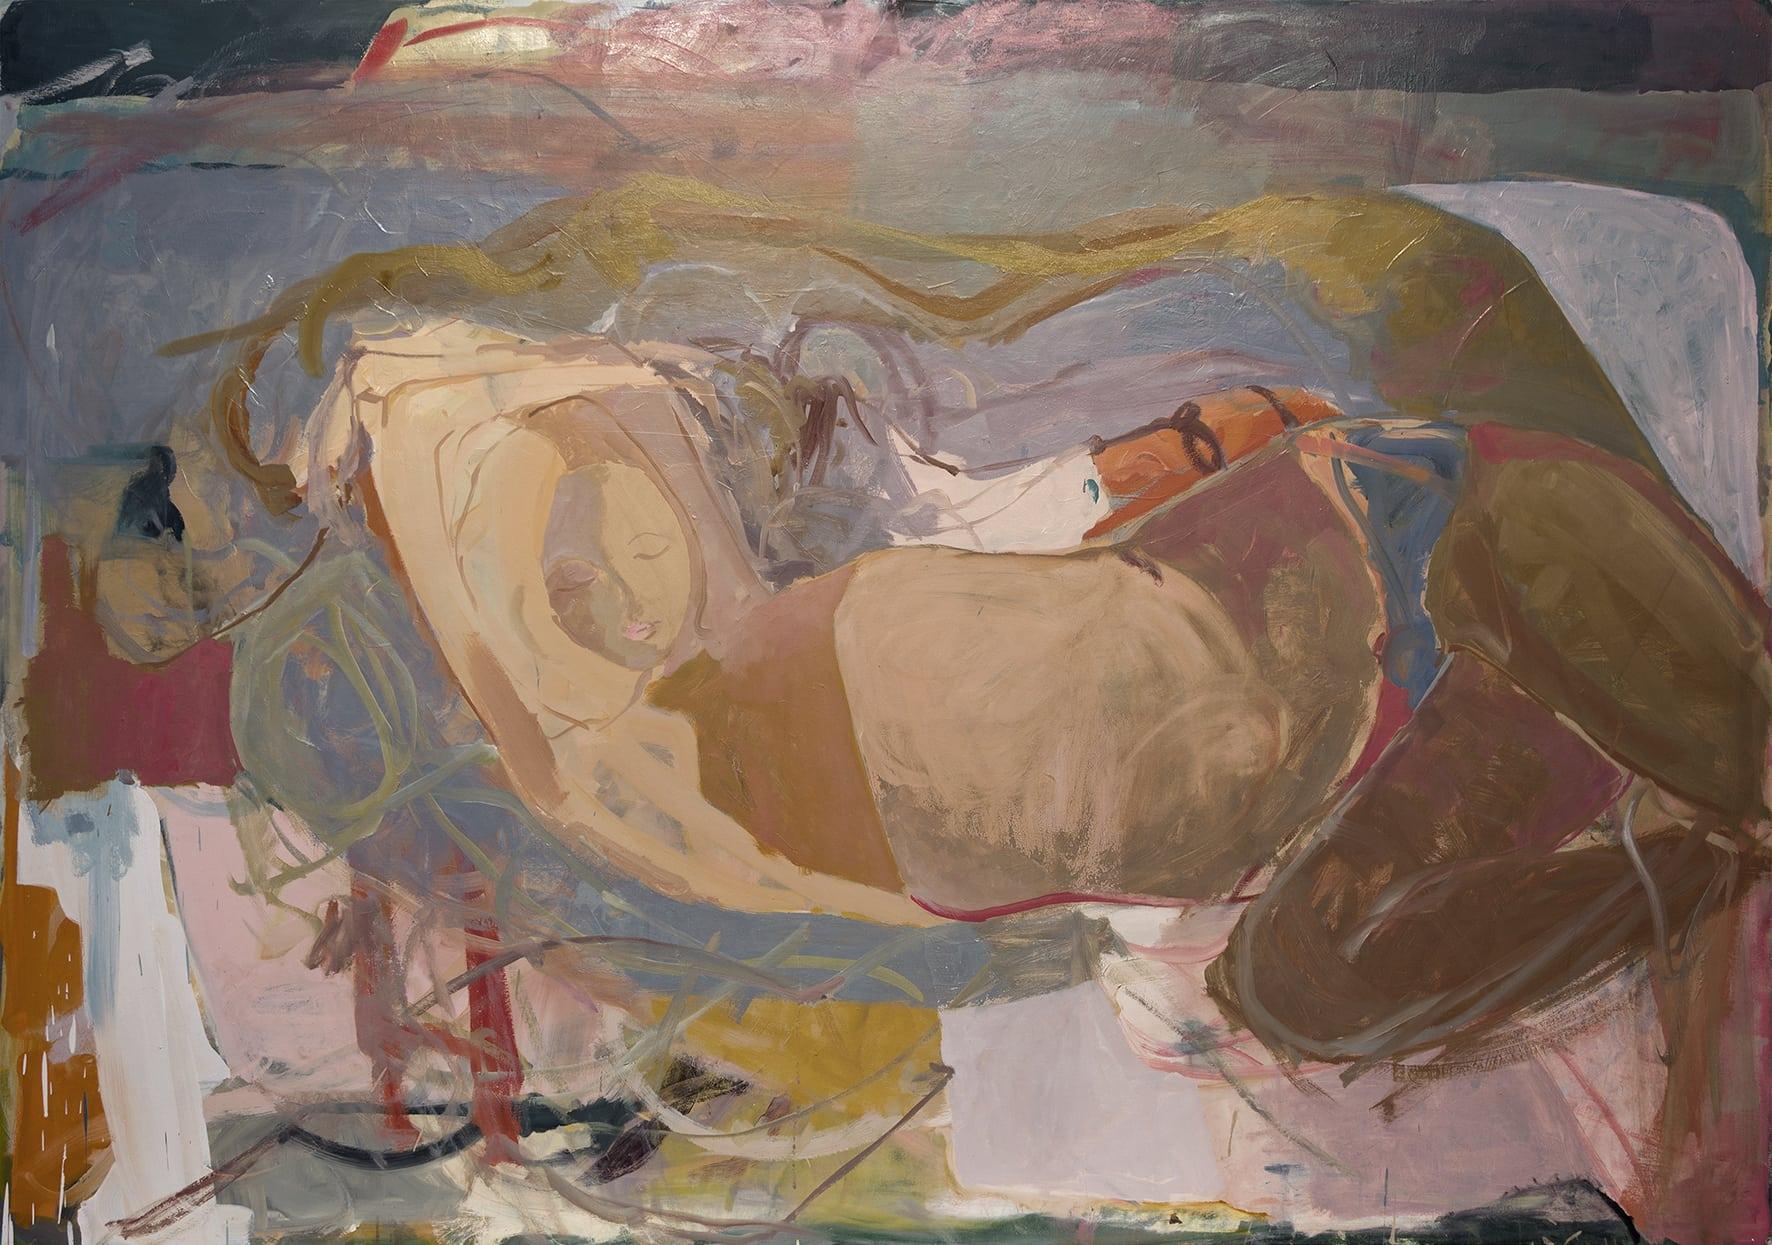 Elaine Speirs, Waiting for Love, 2017